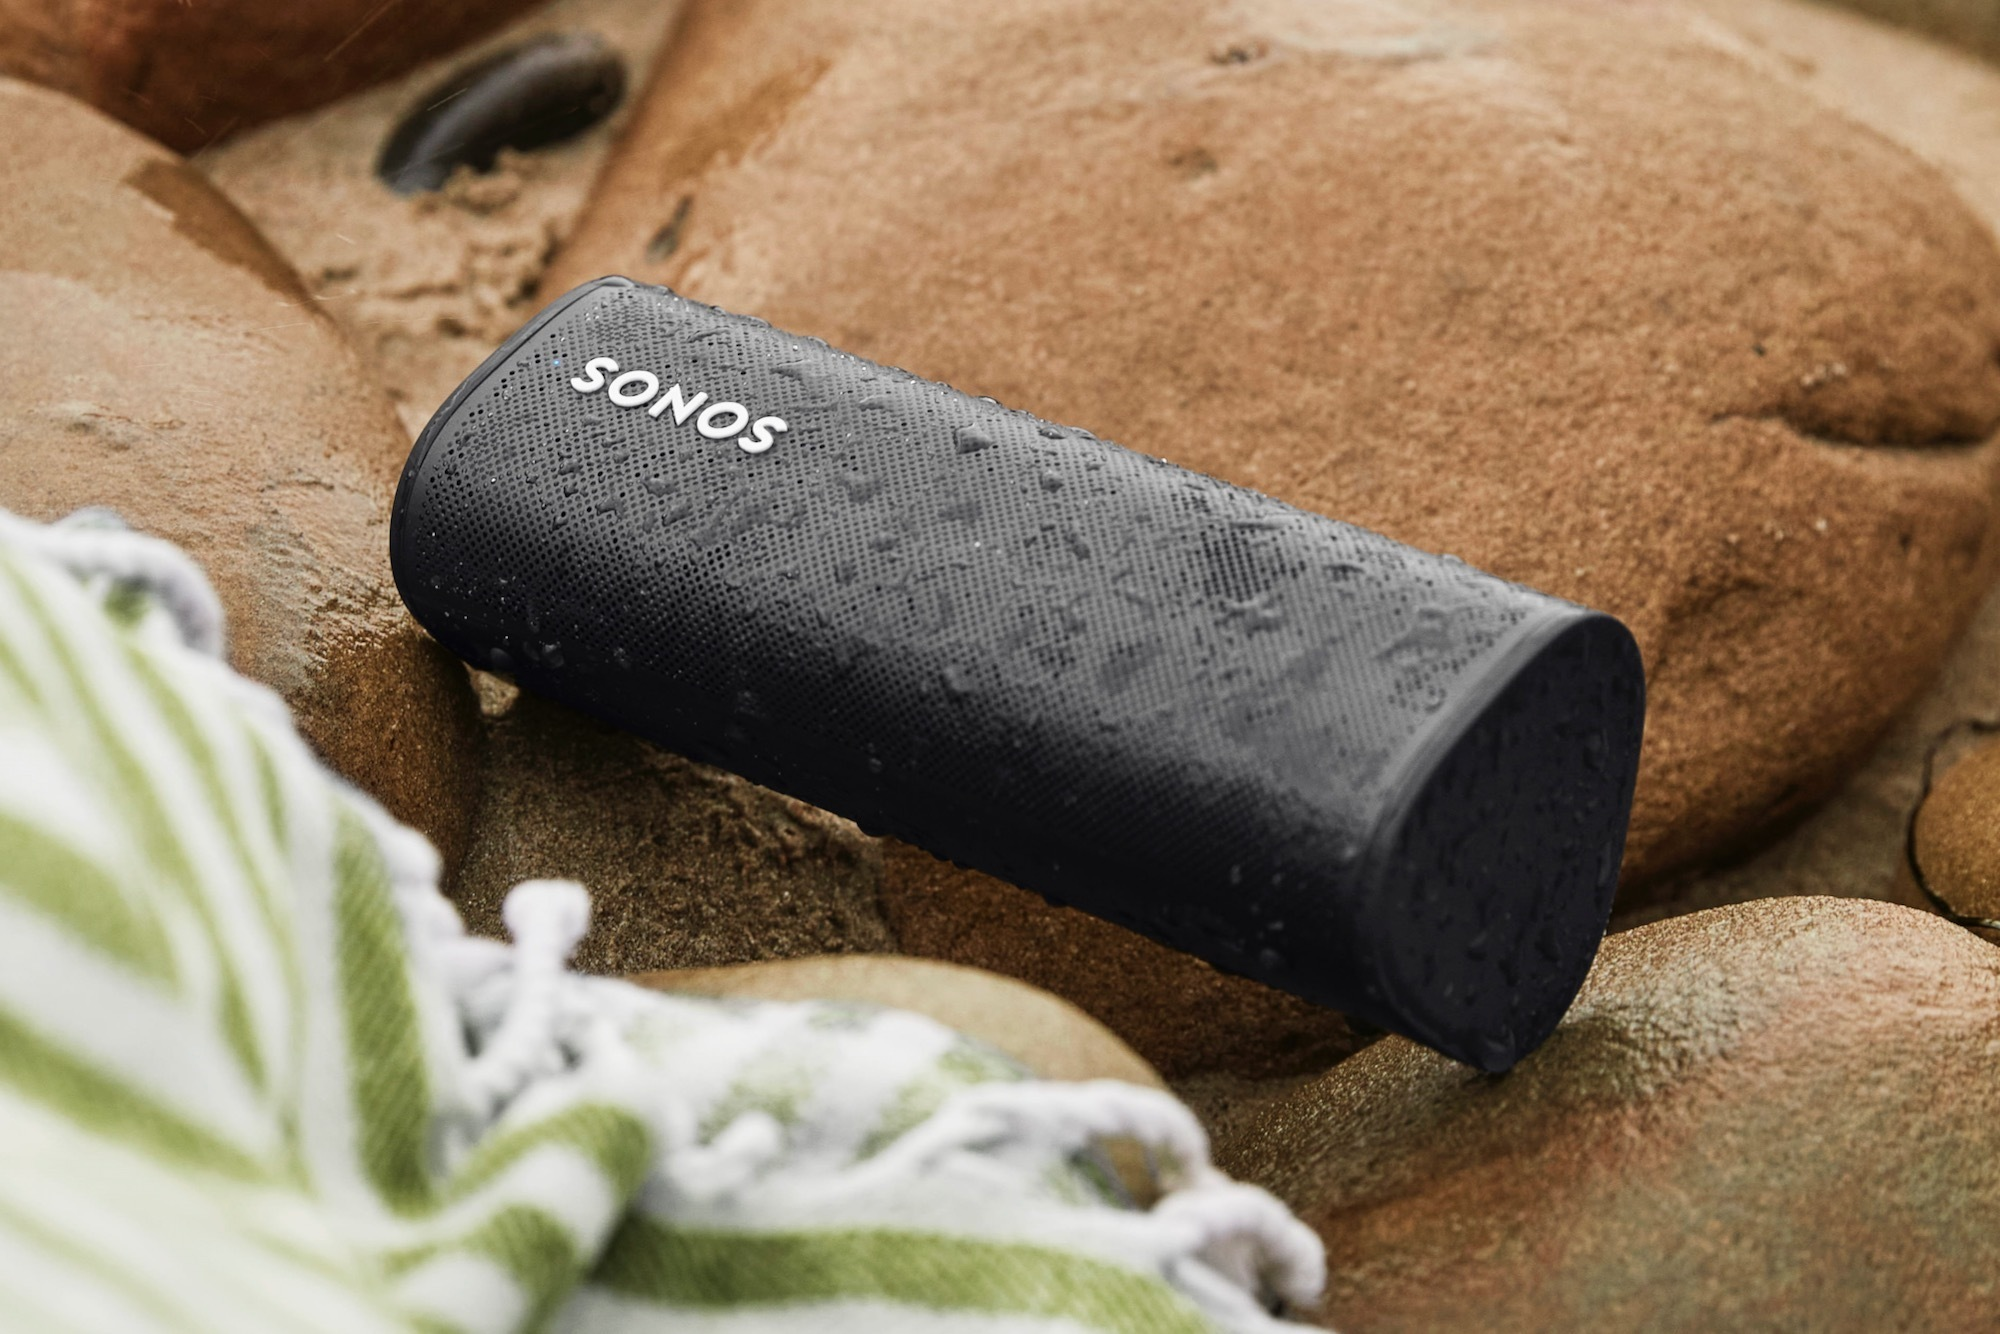 Sonos Roam Water Resistant